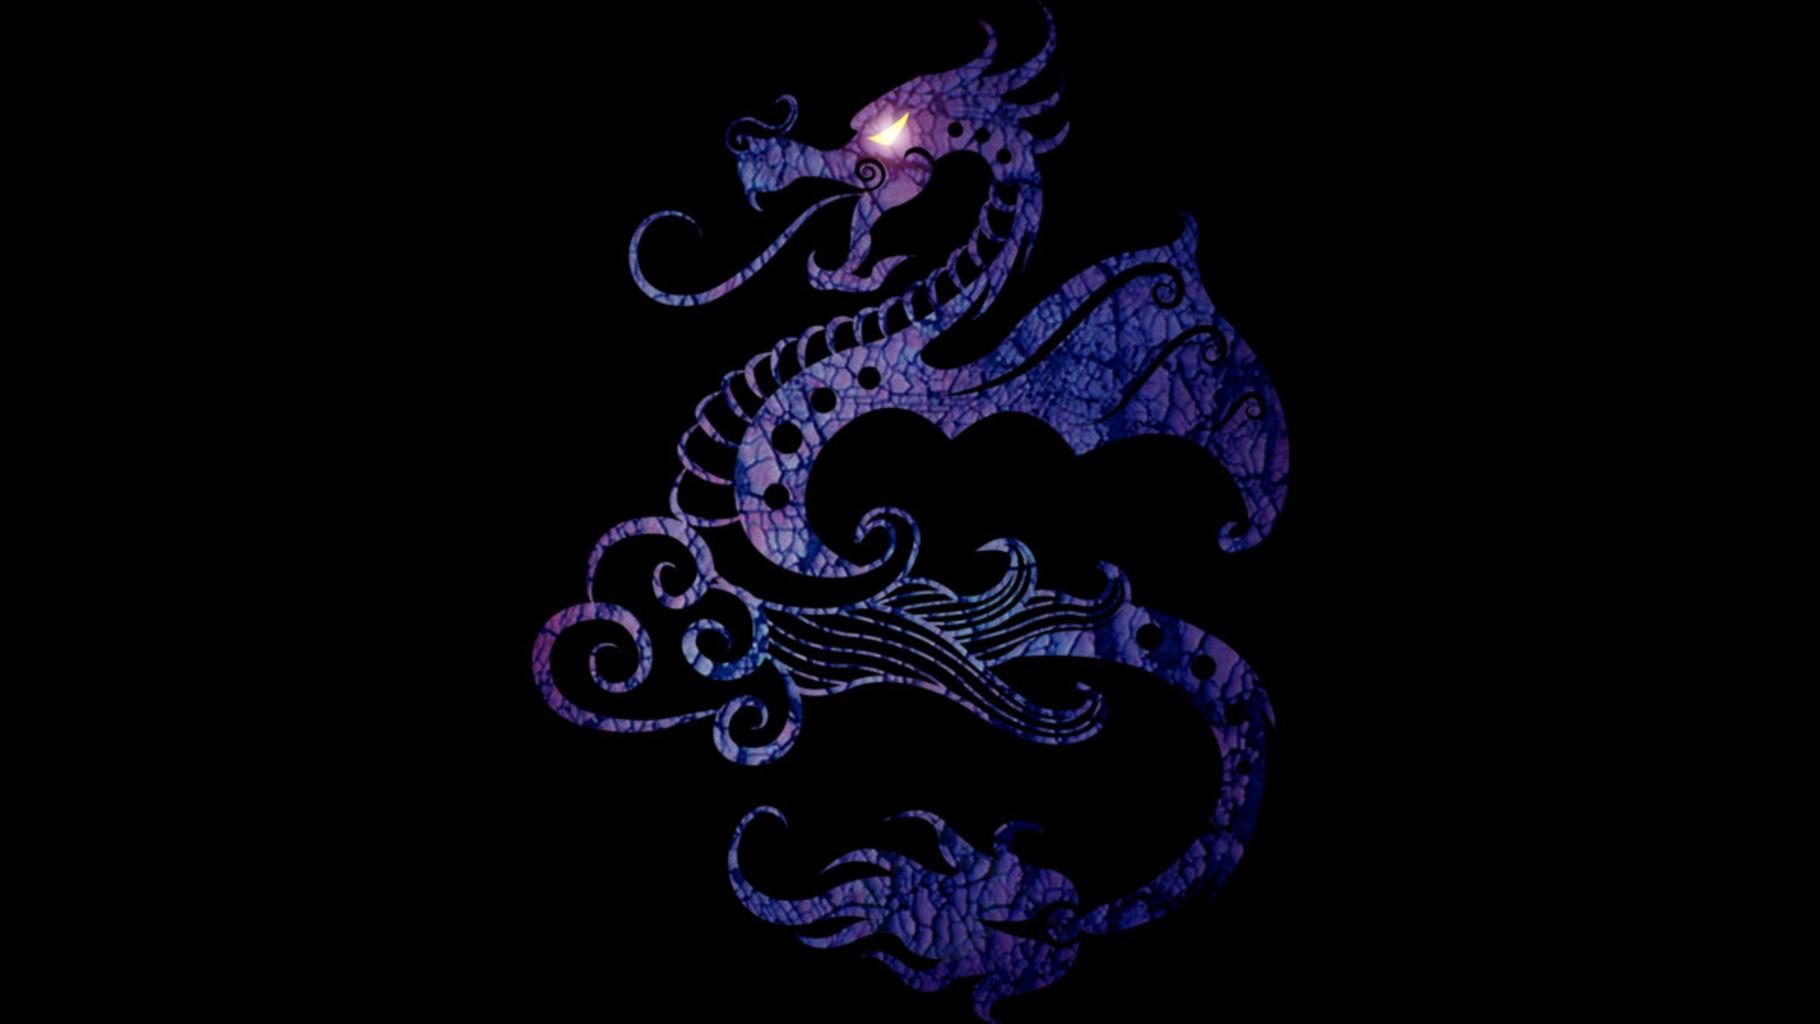 Design by Humans: Dragon Eye